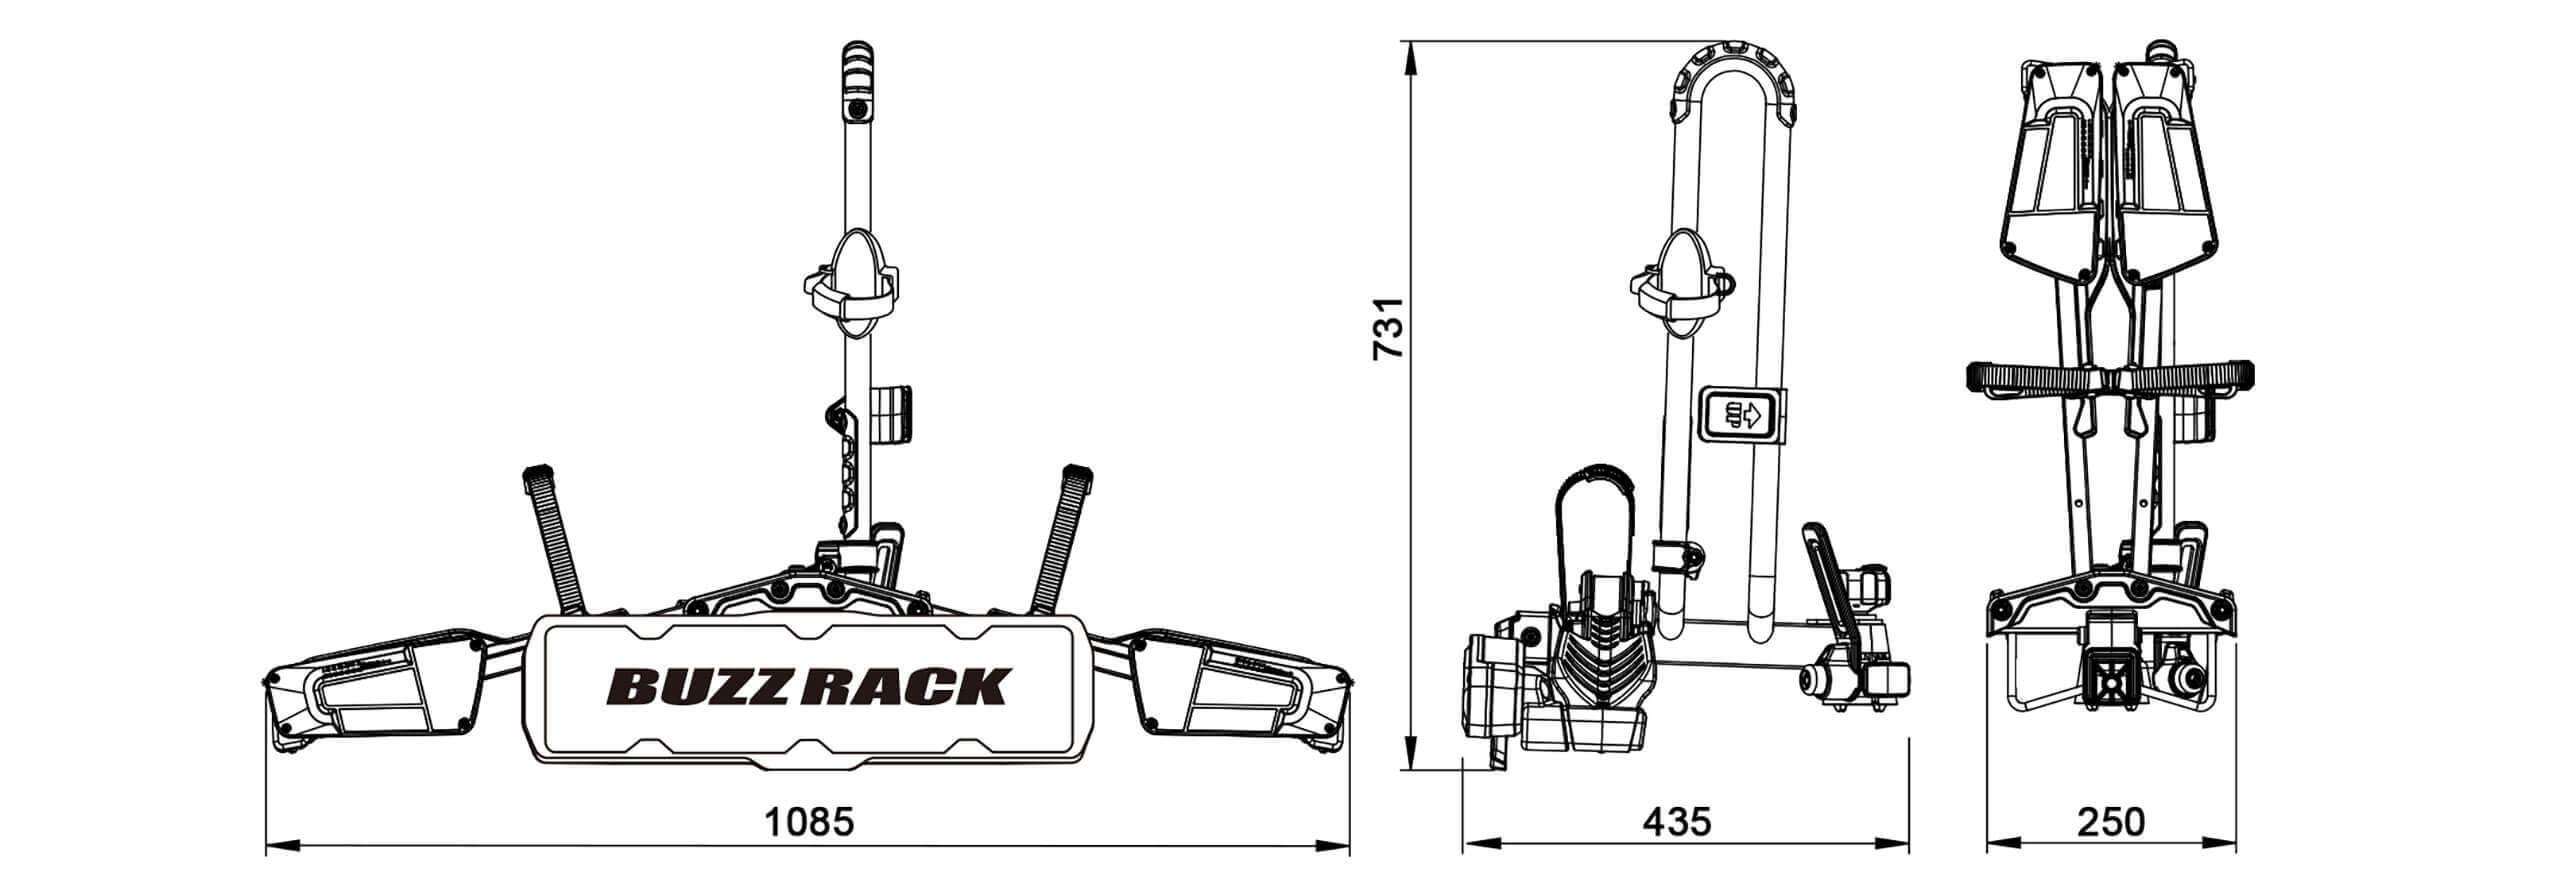 Buzz Rack Eazzy 1 Folding Bike Rack No Brp721